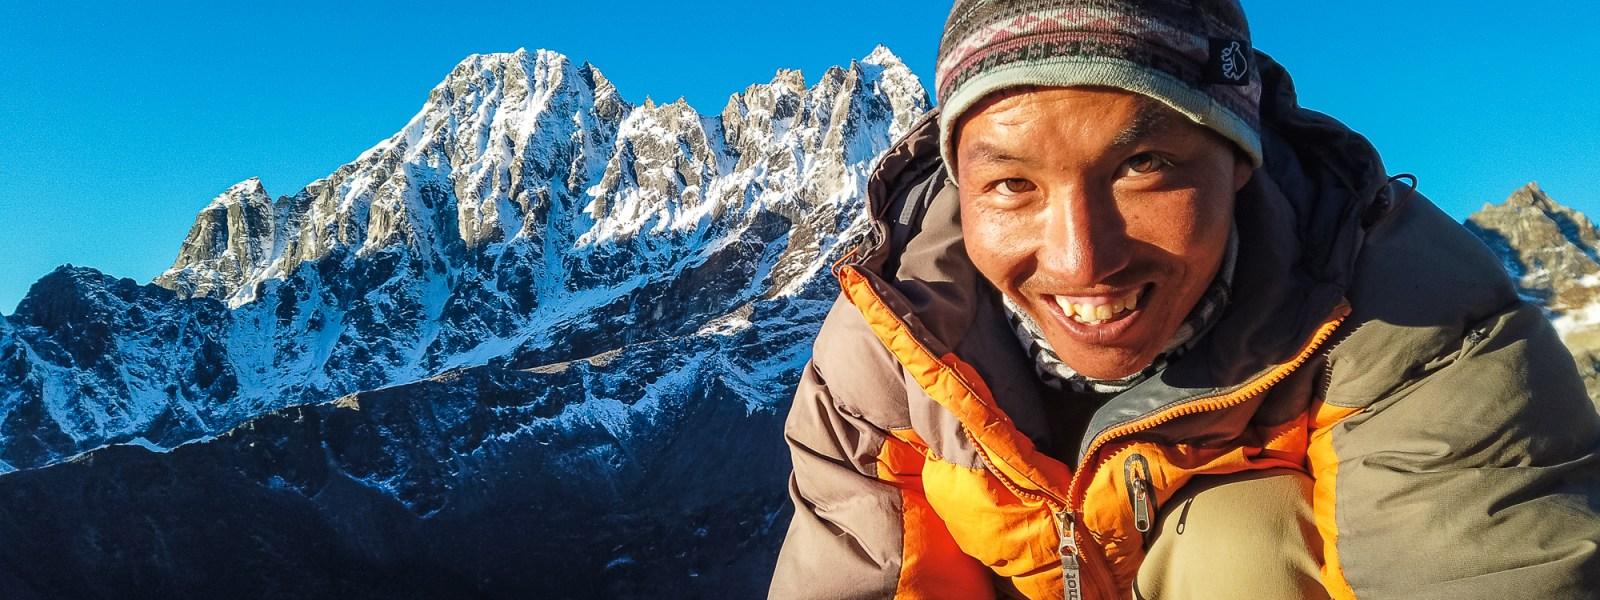 Help Sherpa Guides & Porters Affected By Coronavirus Lockdown